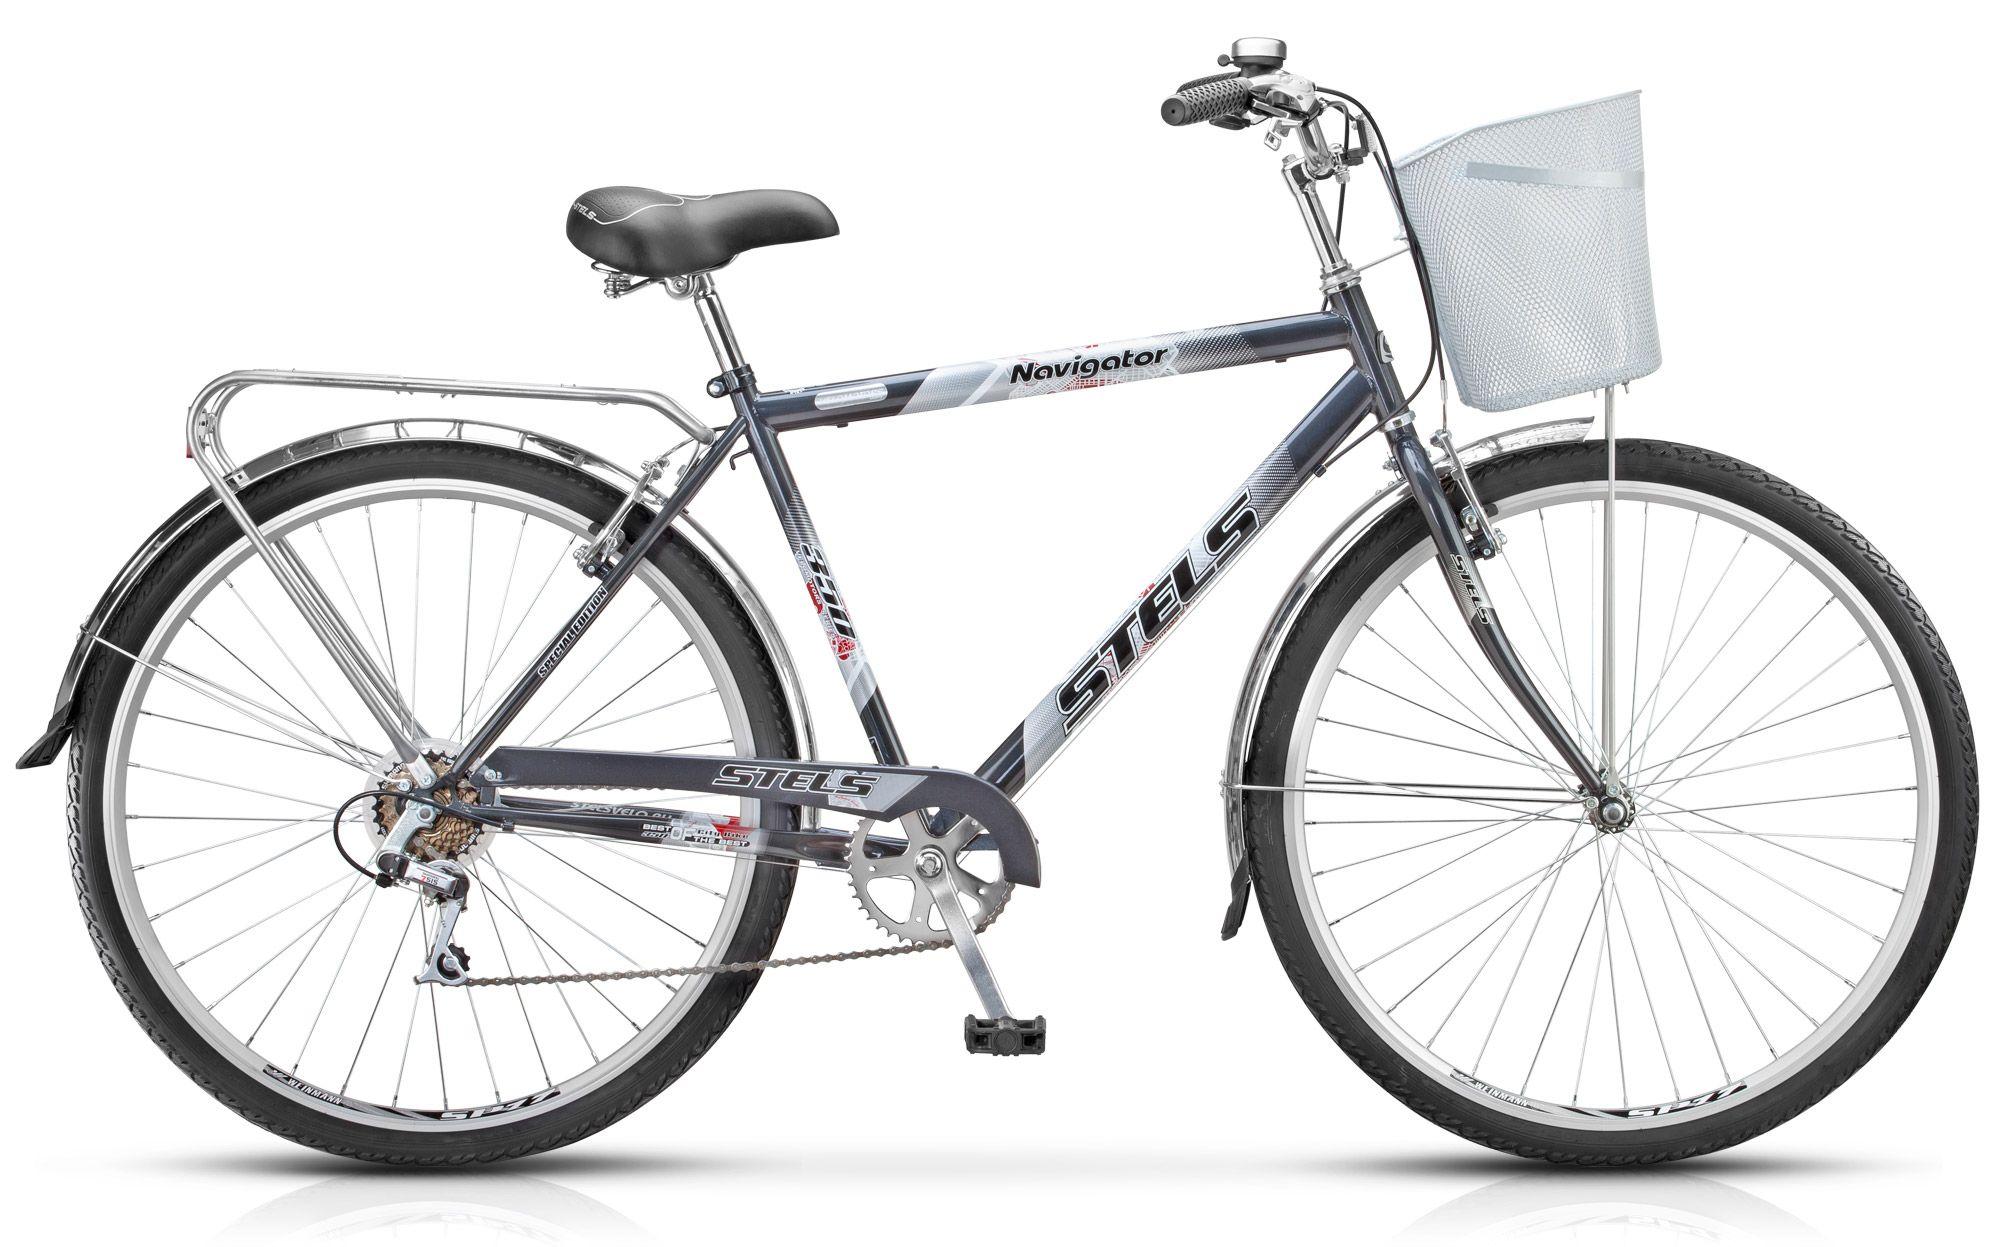 Велосипед Stels Navigator 350 Gent 28 (Z010) 2018 велосипед stels navigator 300 lady 28 z010 20 морская волна